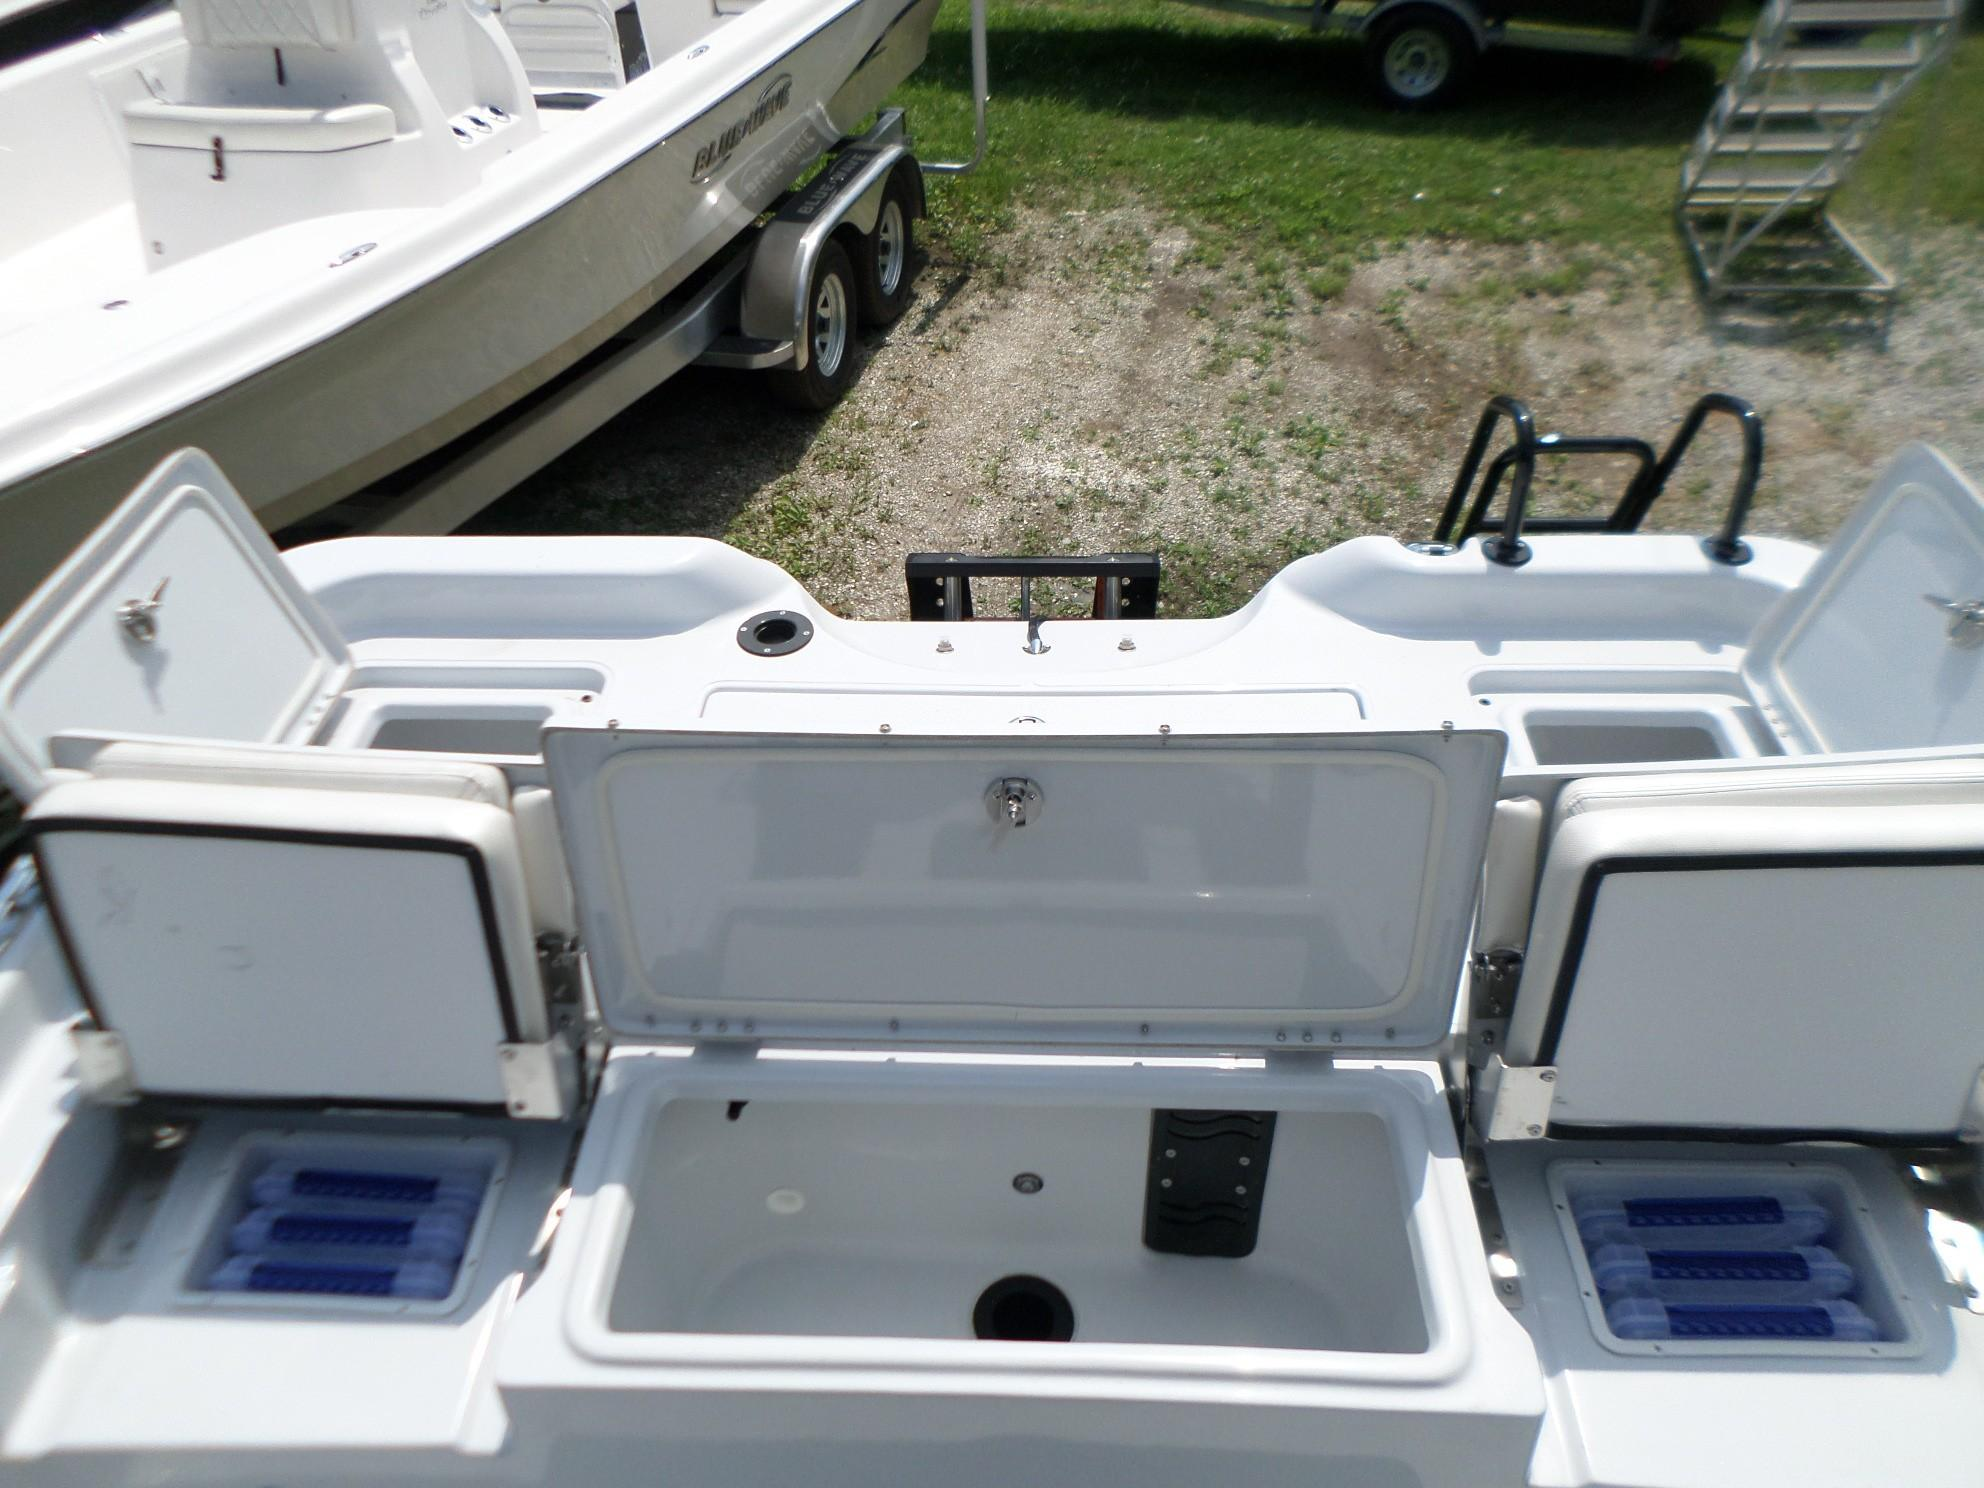 New  2018 24.42' Blue Wave 2400 PureBay Bay Boat in Slidell, Louisiana